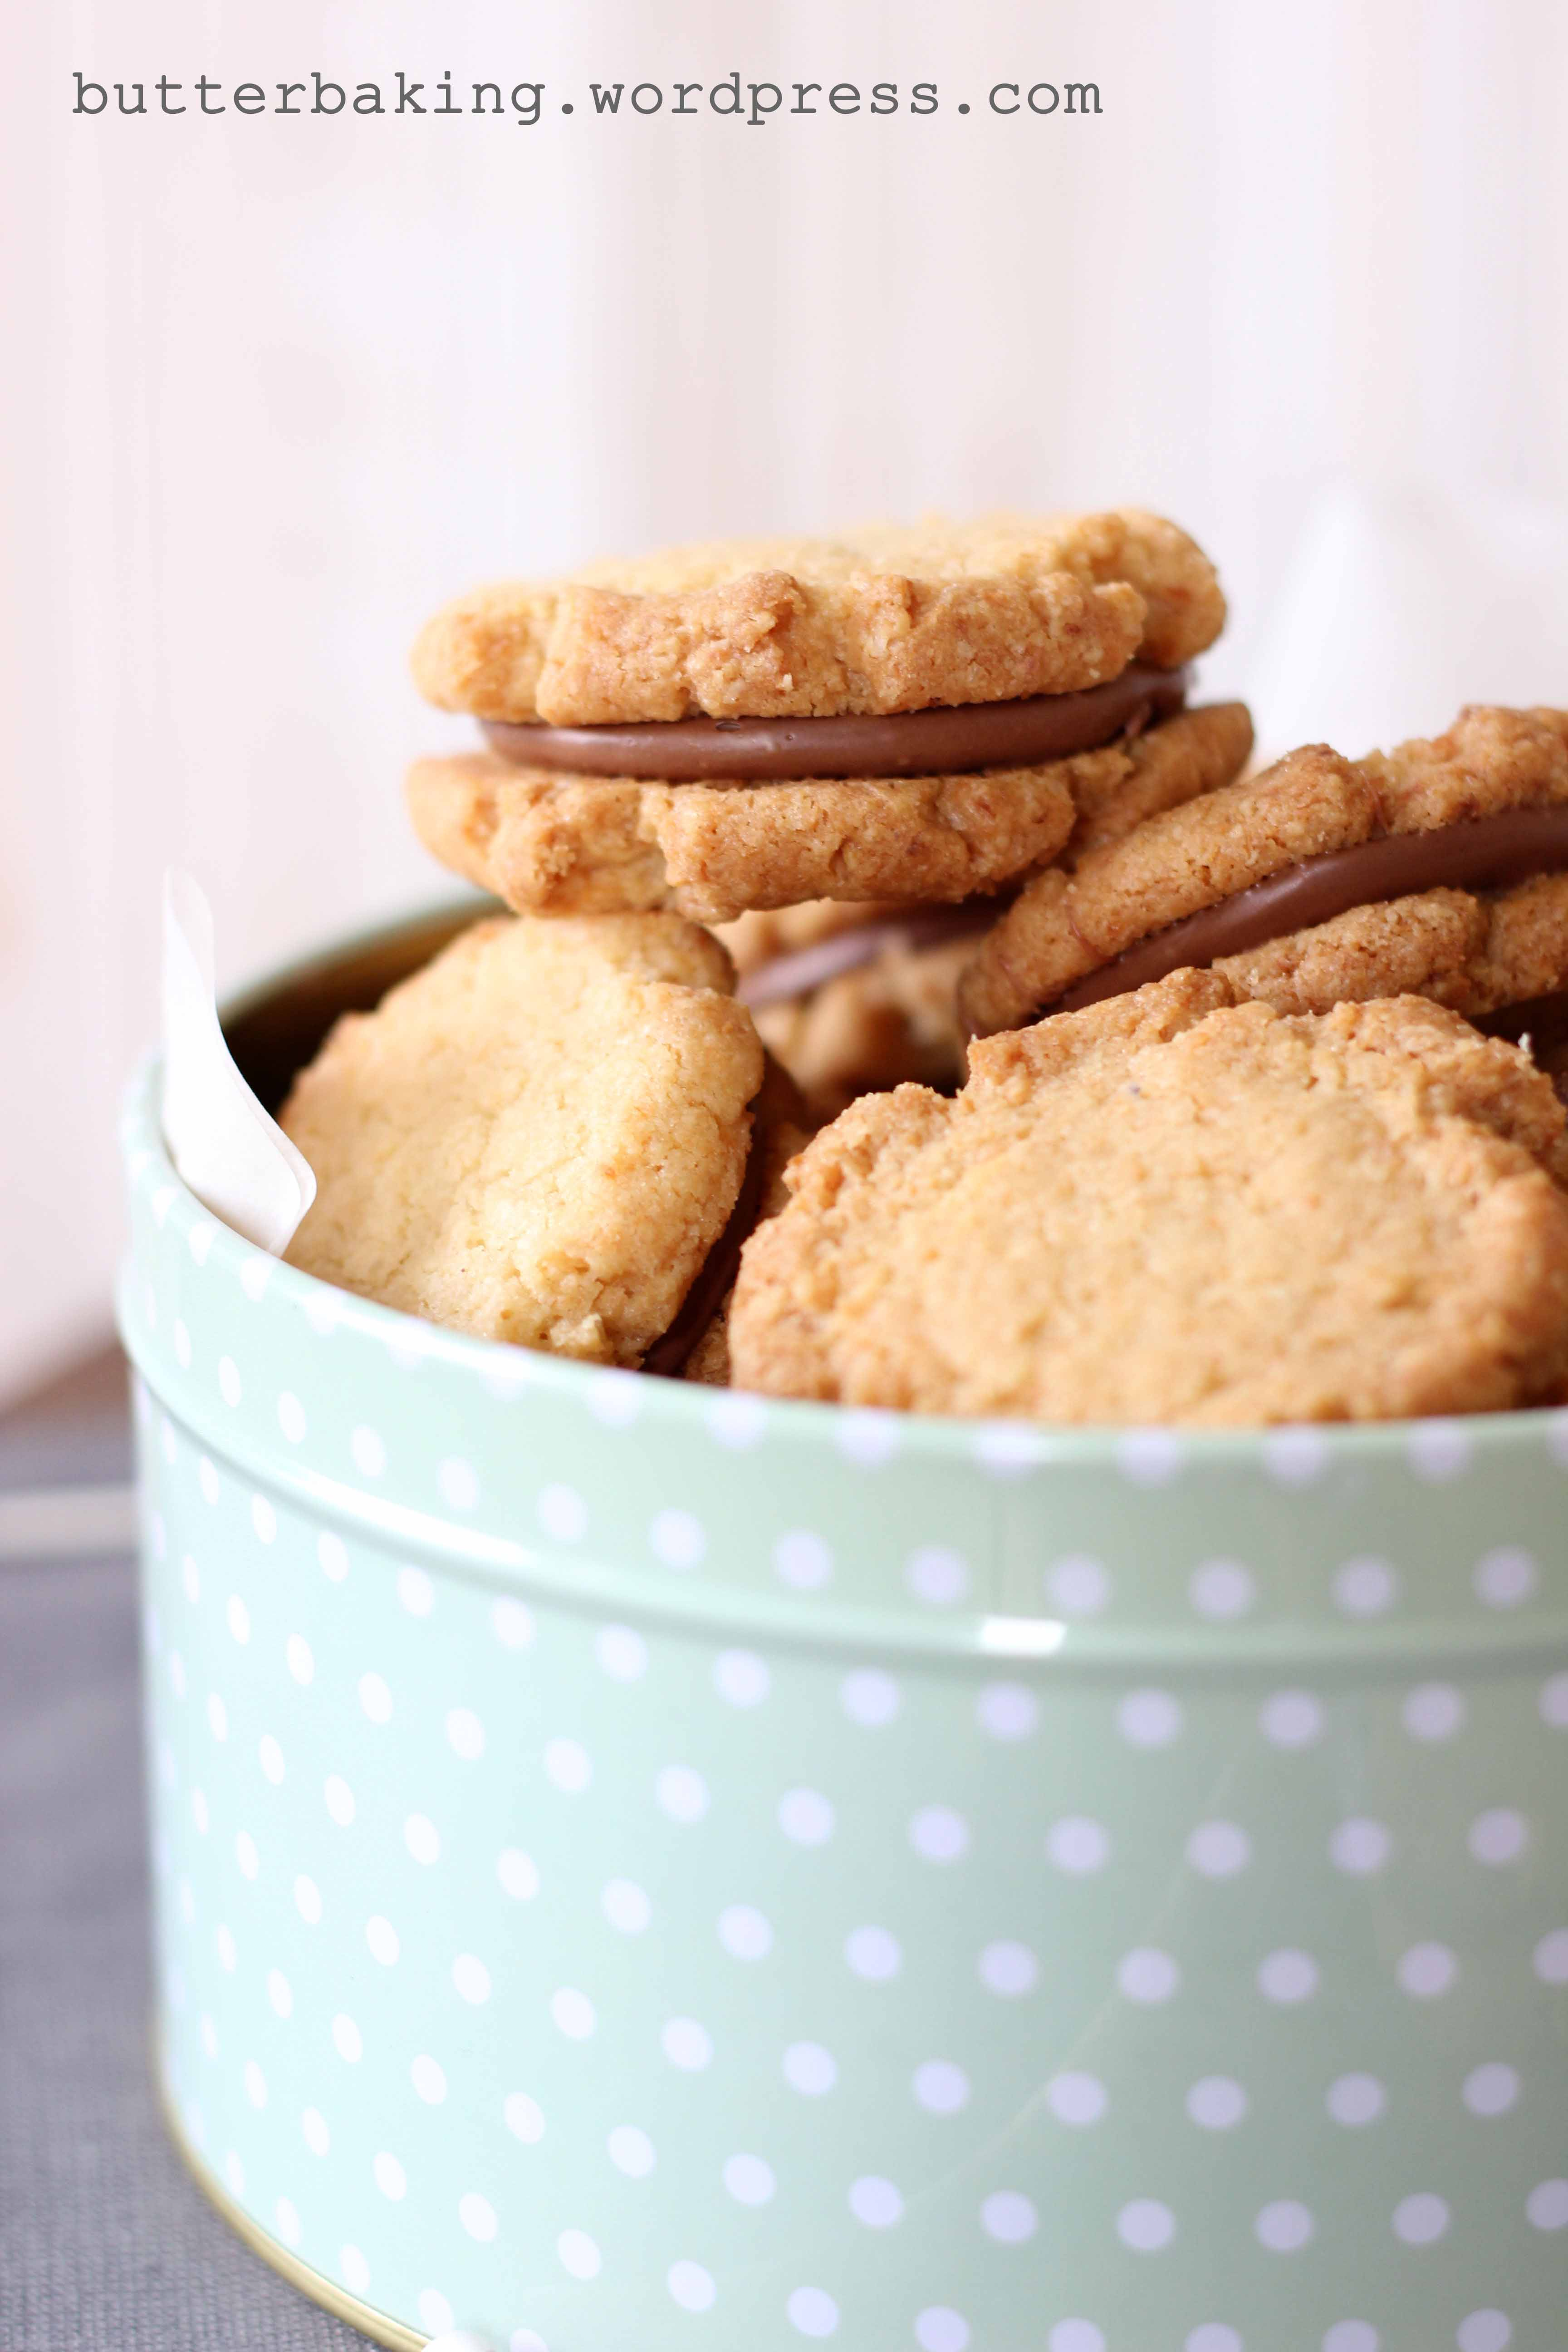 Milk Chocolate Hazelnut Sandwich Cookies (Kingstons) | Butter Baking